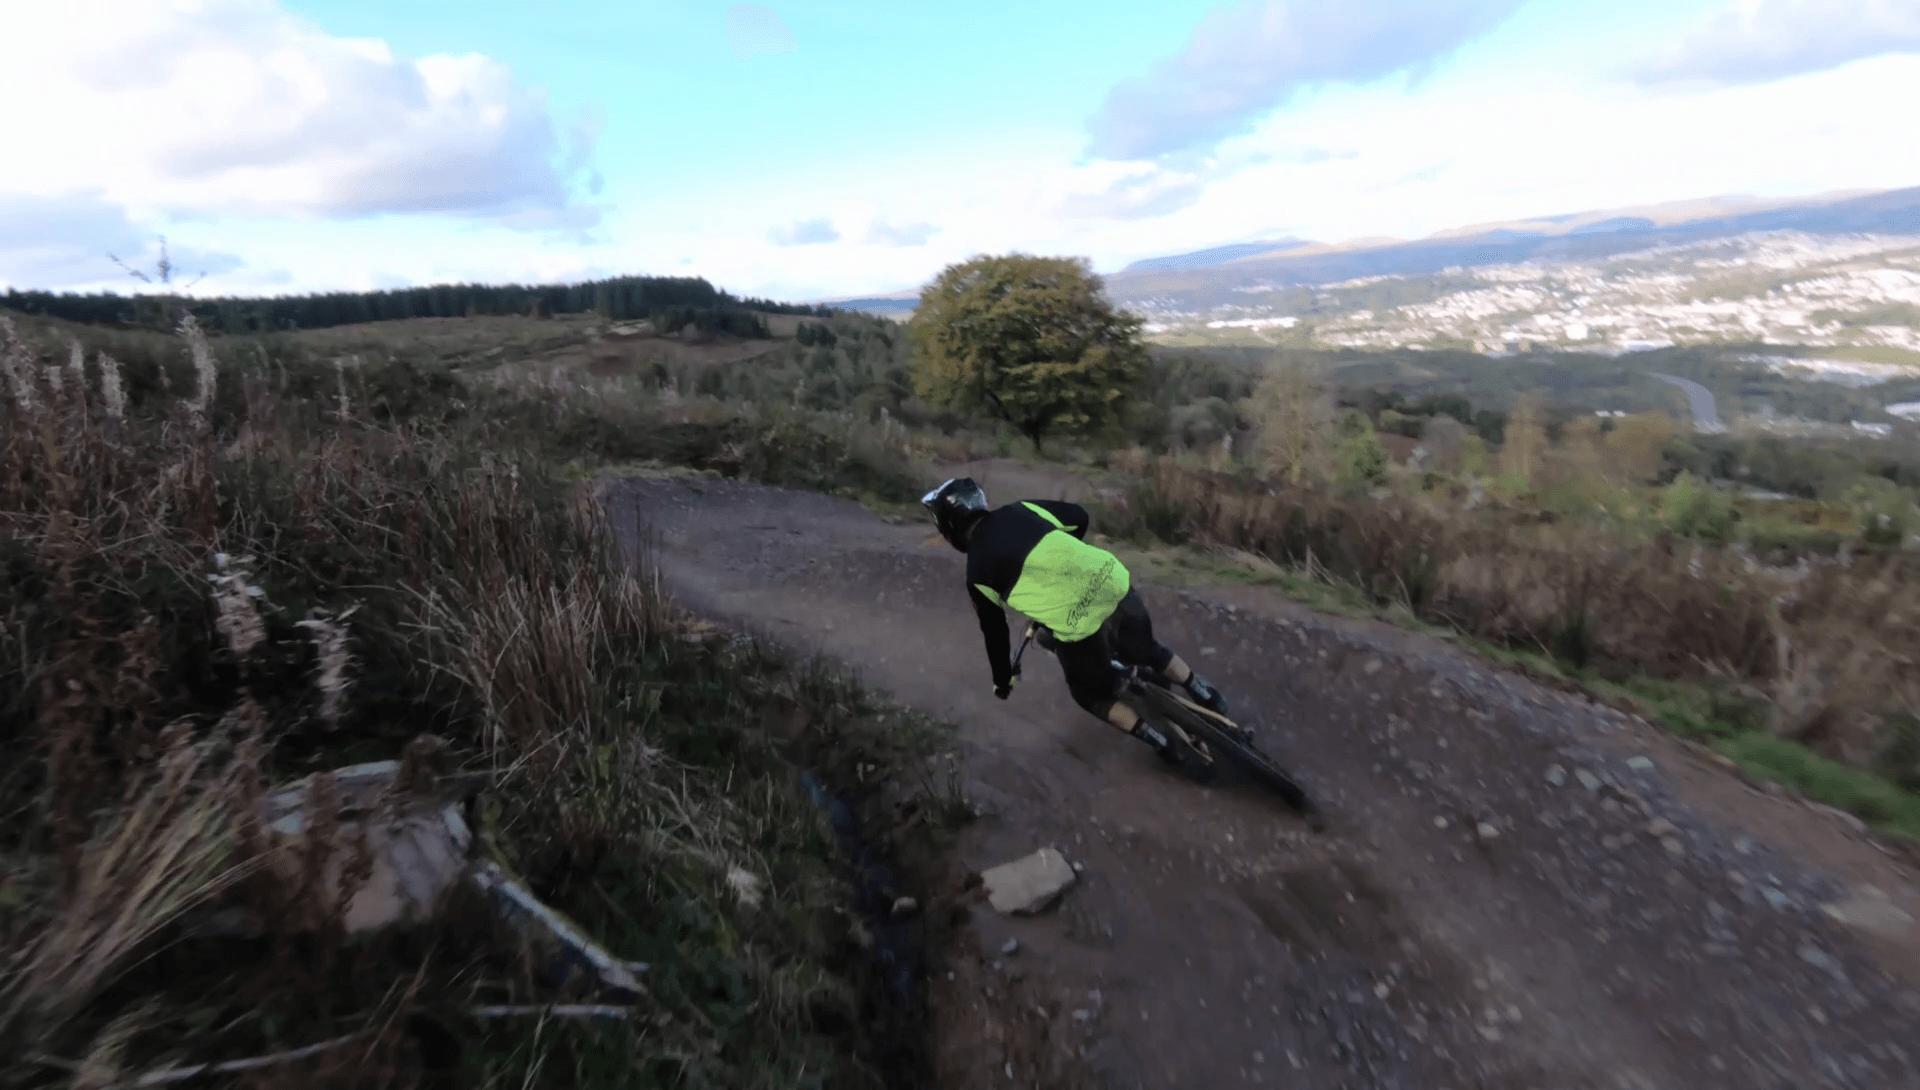 MBUK's Technical Editor Rob Weaver testing on the 2018 Santa Cruz Nomad at Bike Park Wales